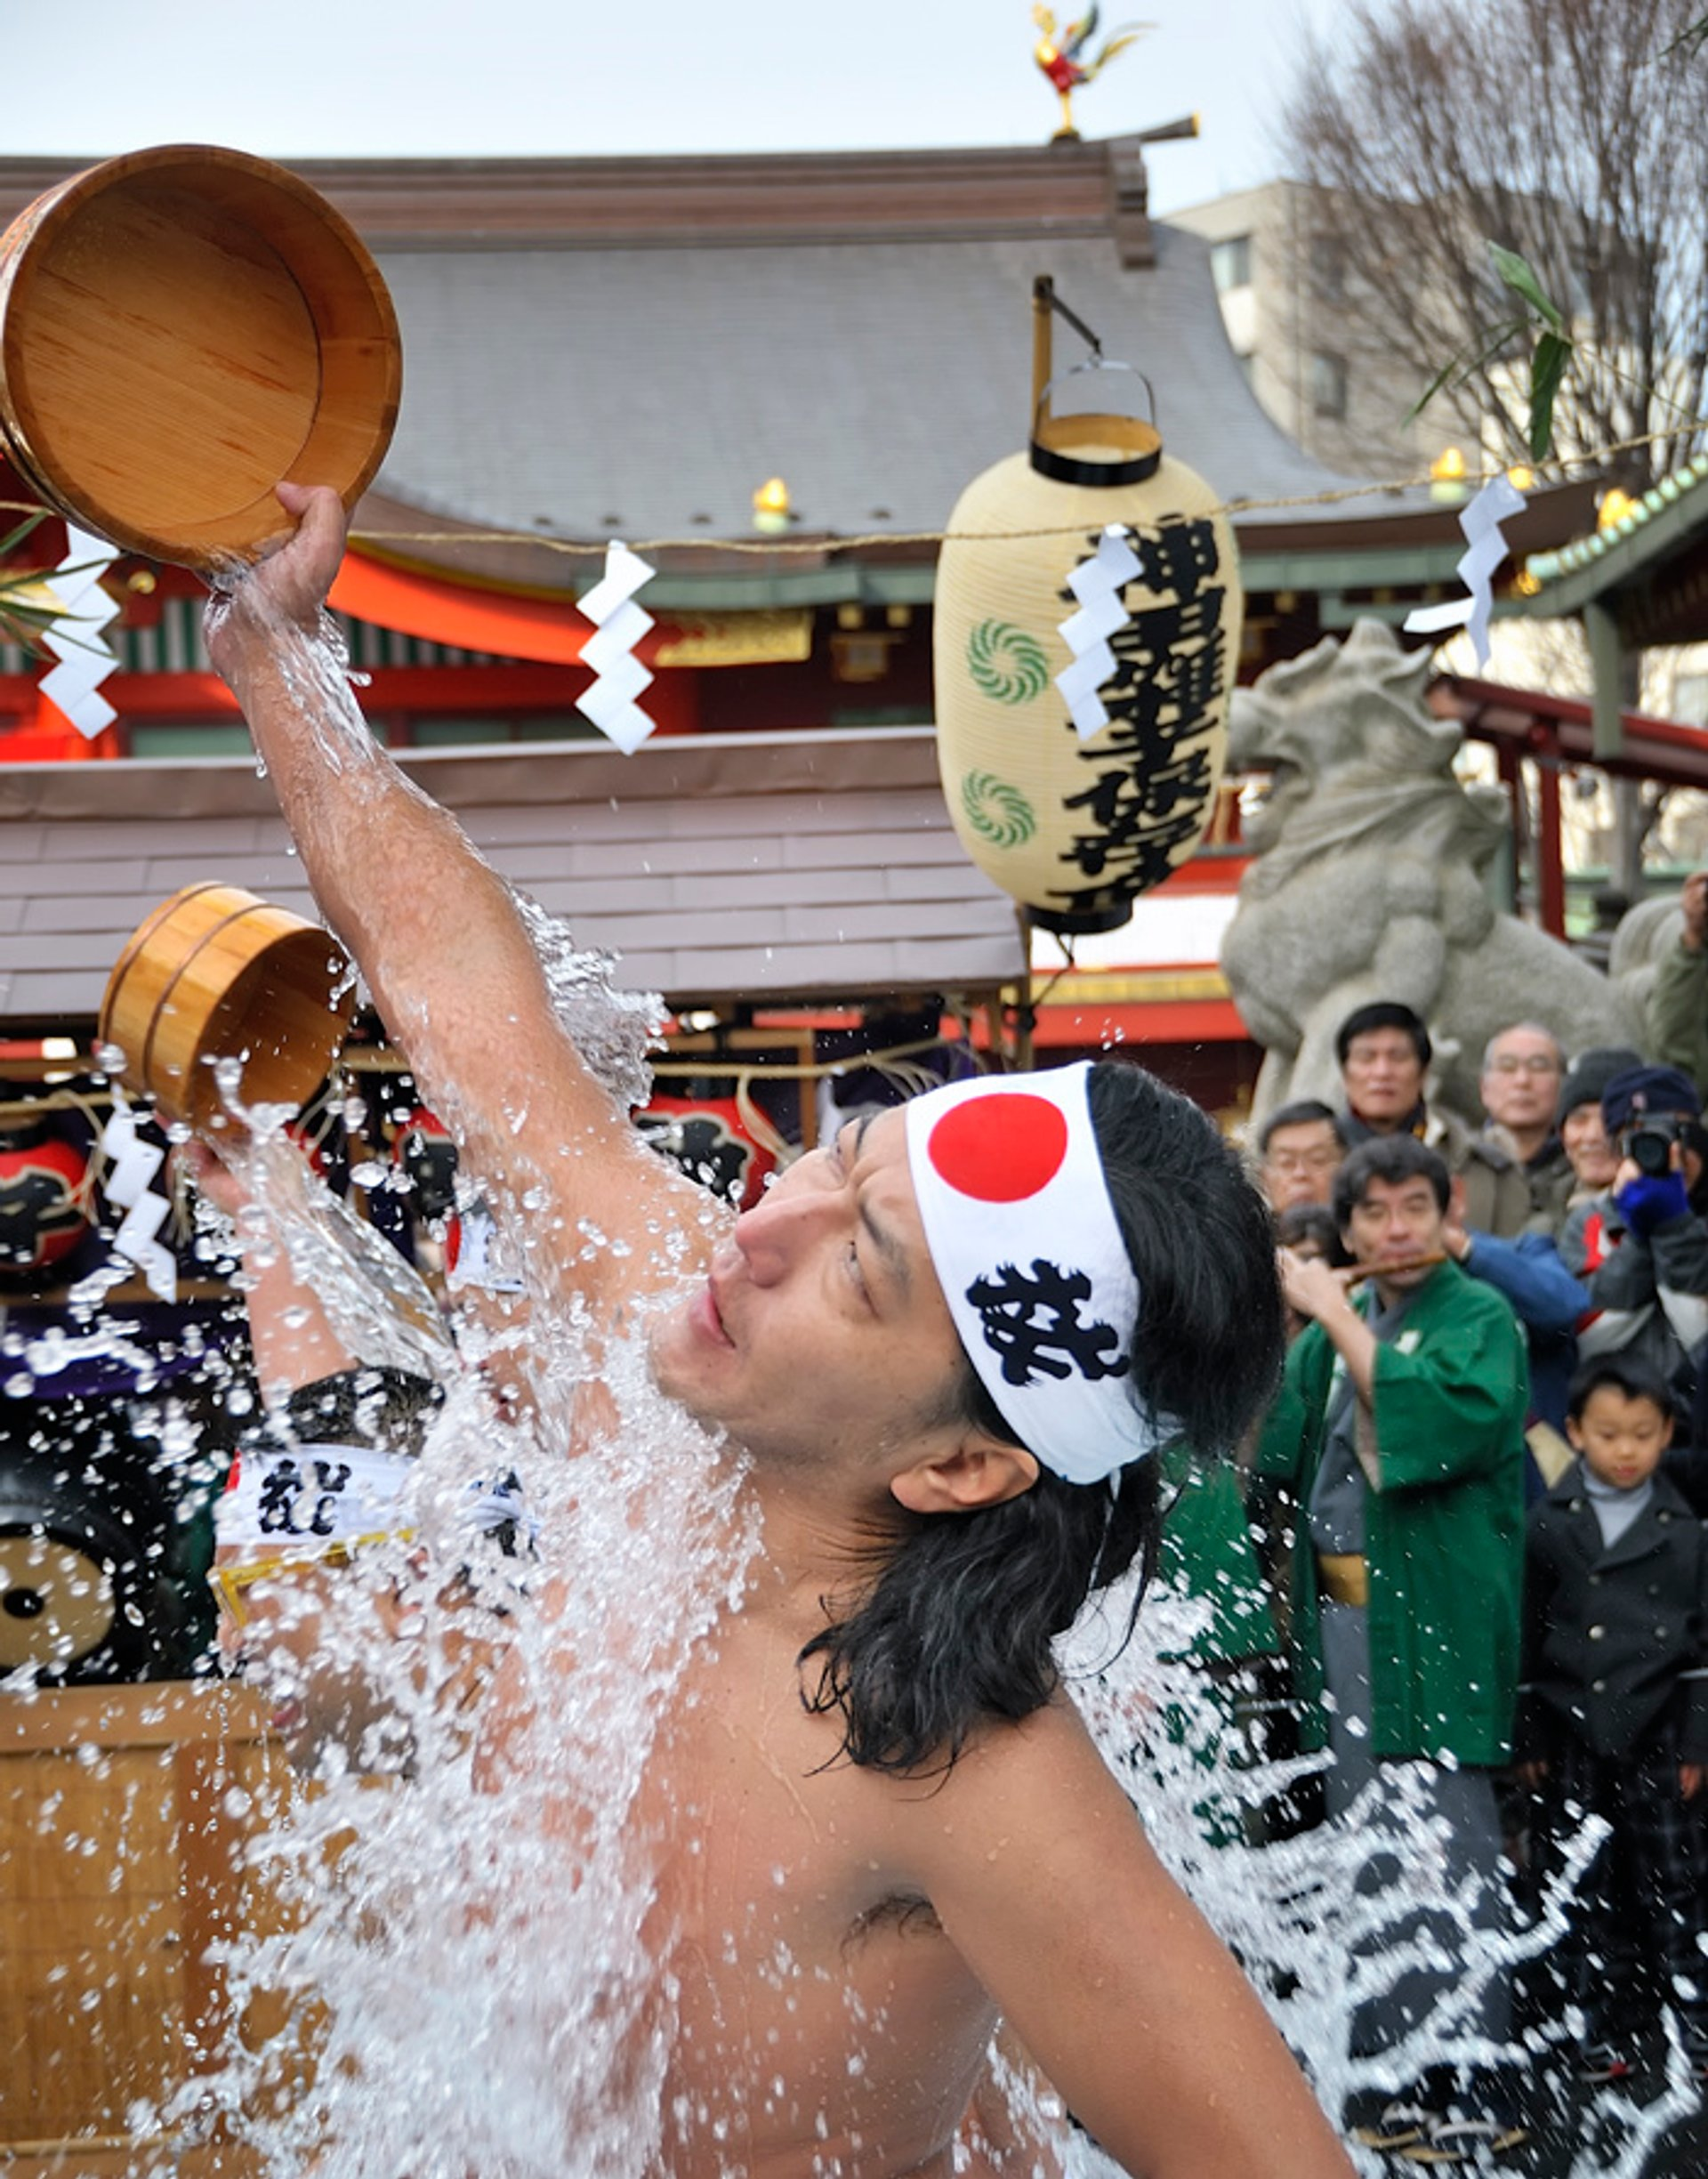 Best time for Daikoku Matsuri in Tokyo 2020